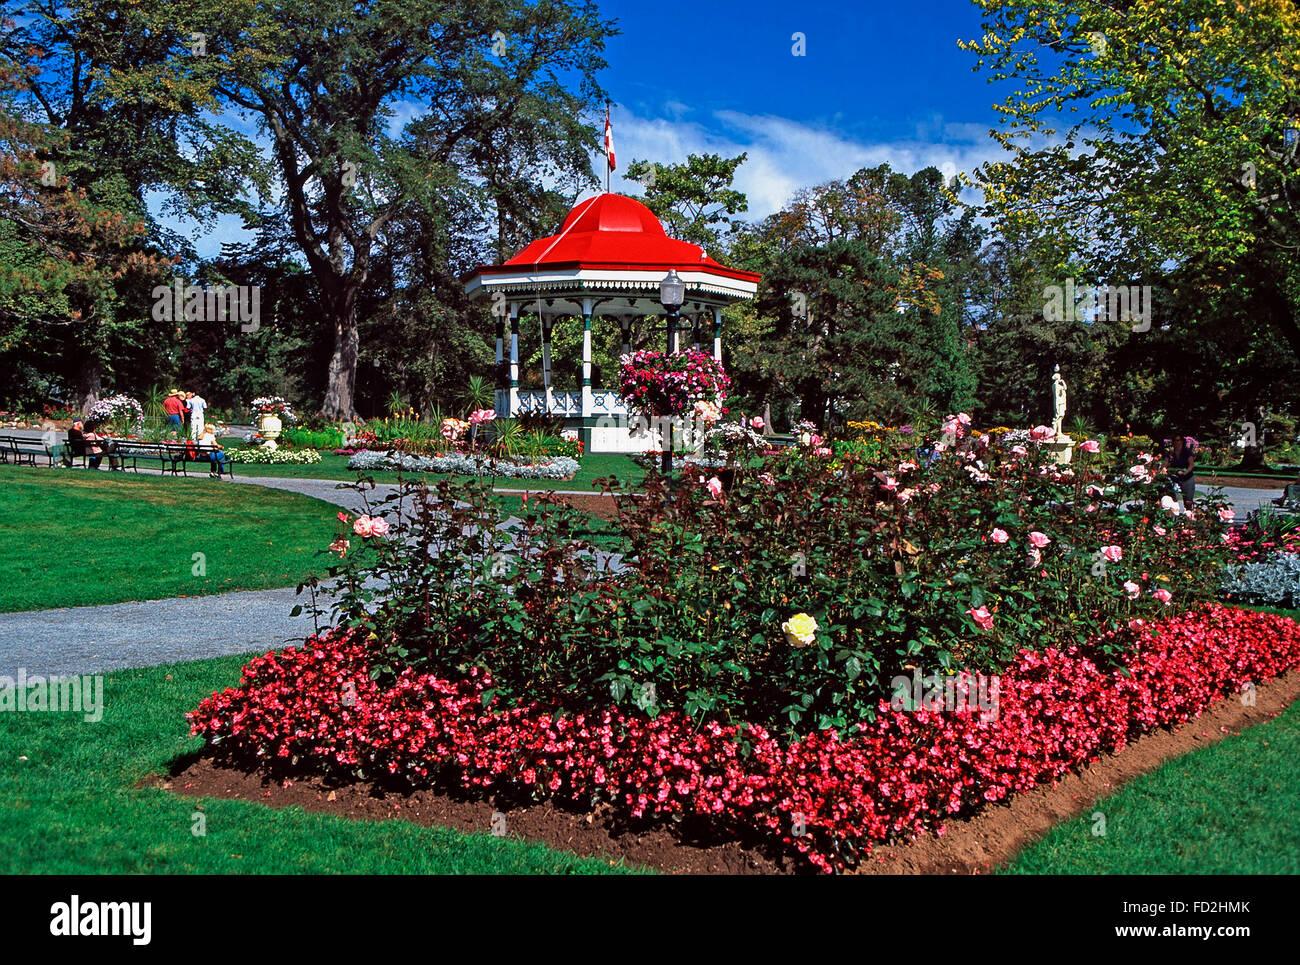 Halifax Public Gardens,Nova Scotia - Stock Image